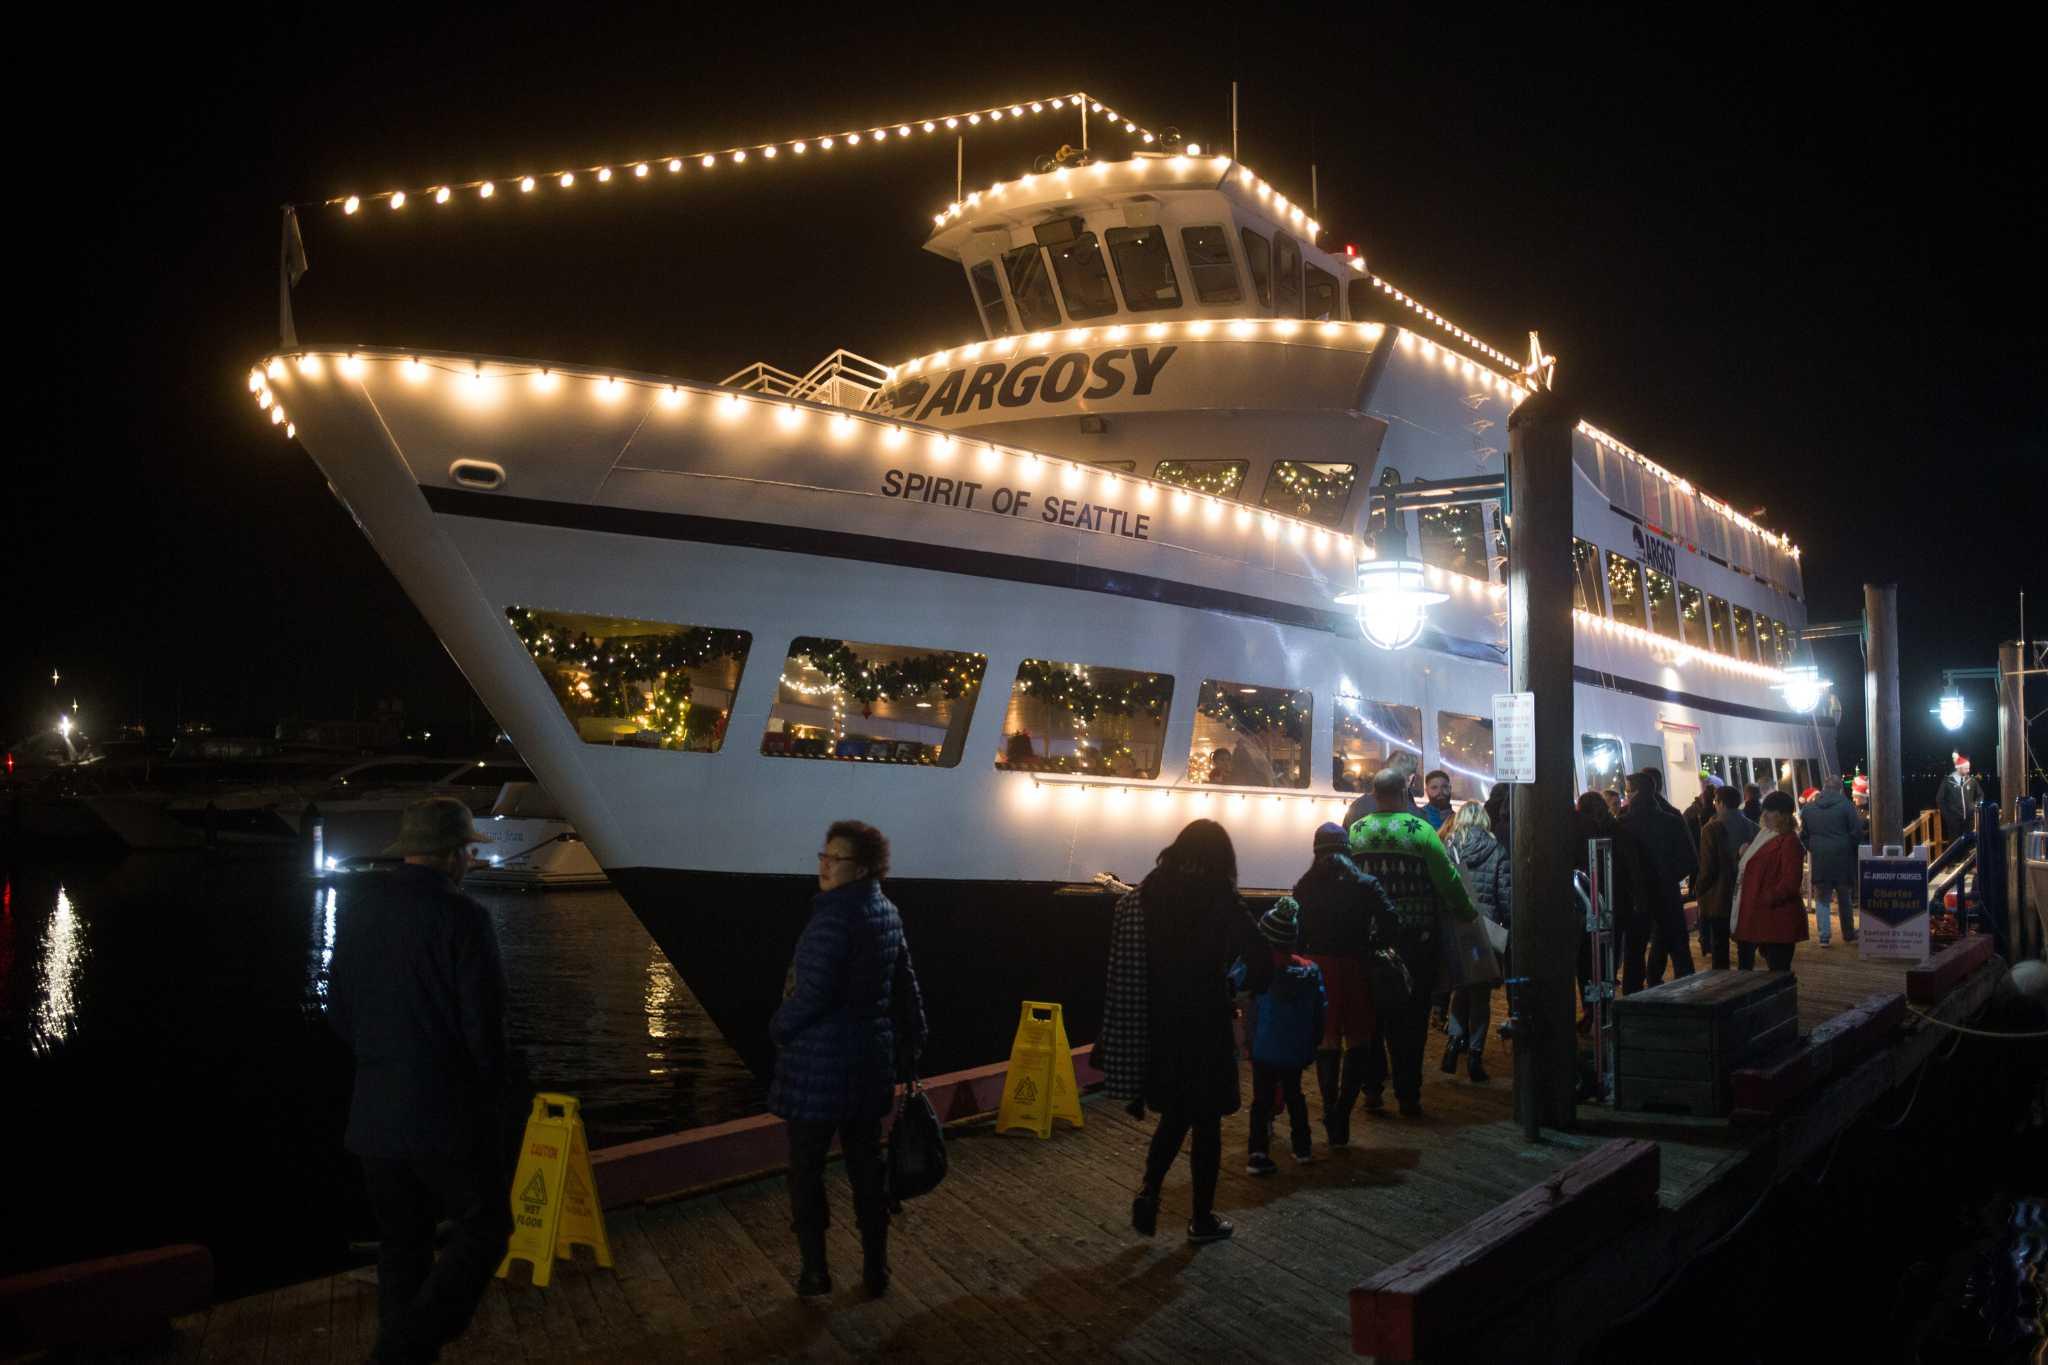 Christmas Ships Seattle 2021 Argosy Cruises Suspends Service Until 2021 Cancels Christmas Ship Festival